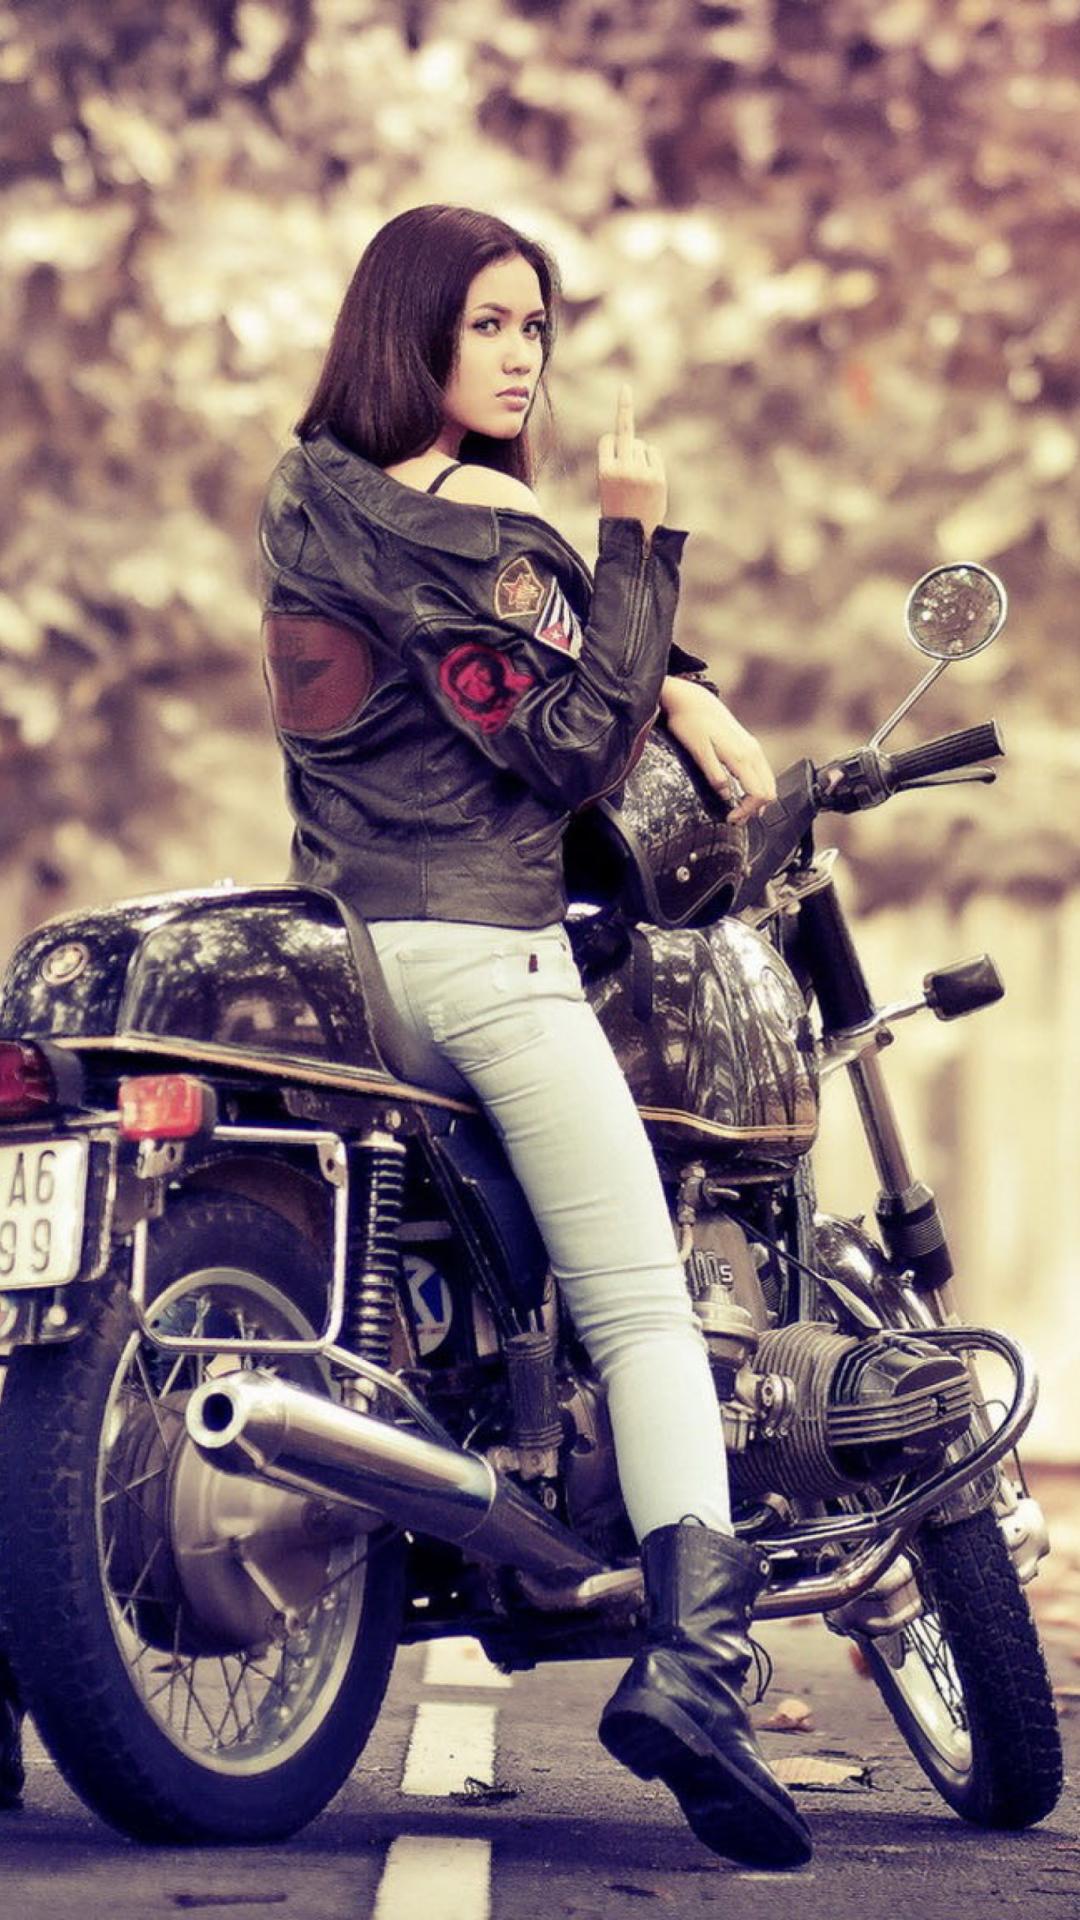 Фото женщин байкерш 4 фотография